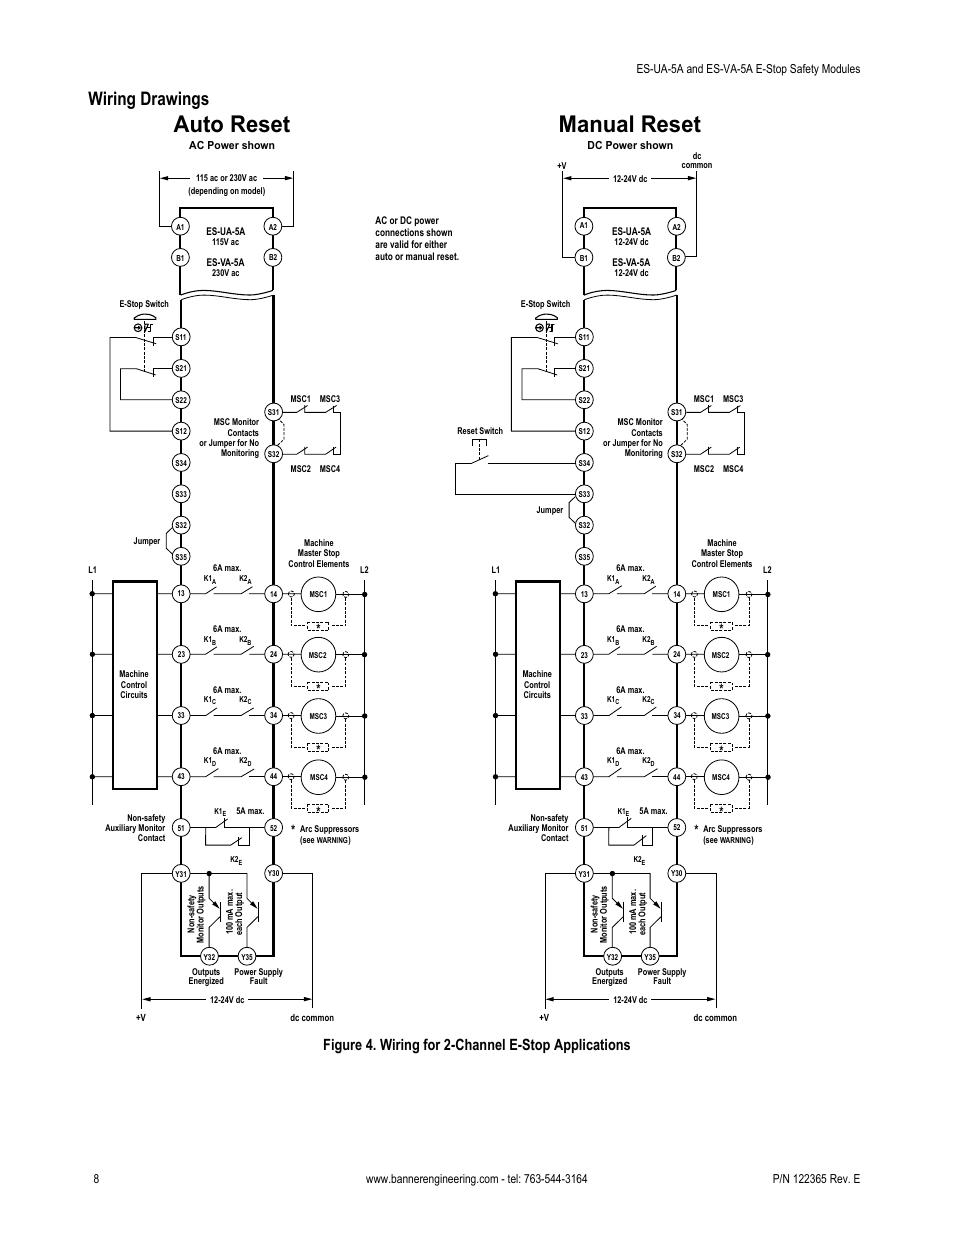 medium resolution of auto reset manual reset wiring drawings figure 4 wiring for 2 rh manualsdir com 230v single phase wiring diagram 230v single phase wiring diagram